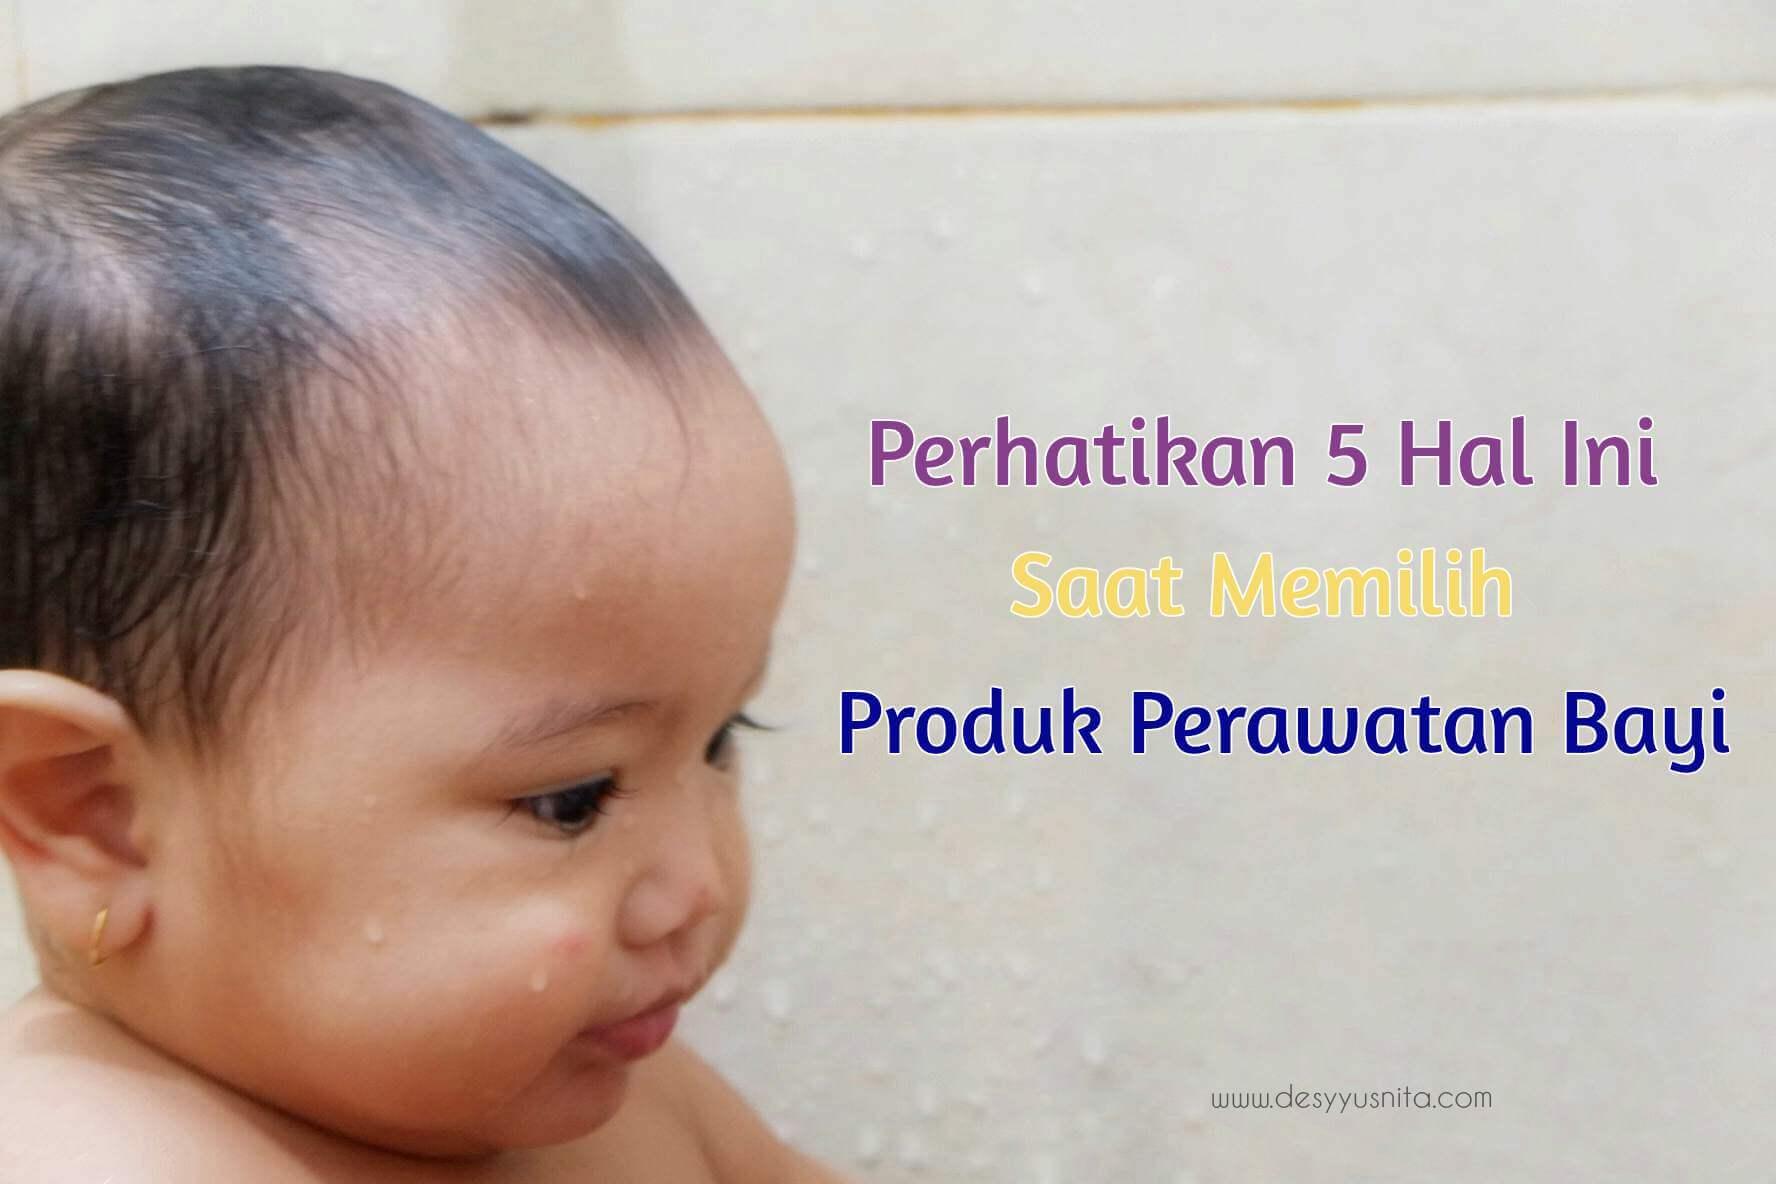 Produk Bayi, Produk Perawatan Bayi, All We Know, Baby Bath, Delicate Skin, Liquid Talc, Baby Lotion, Mothercare